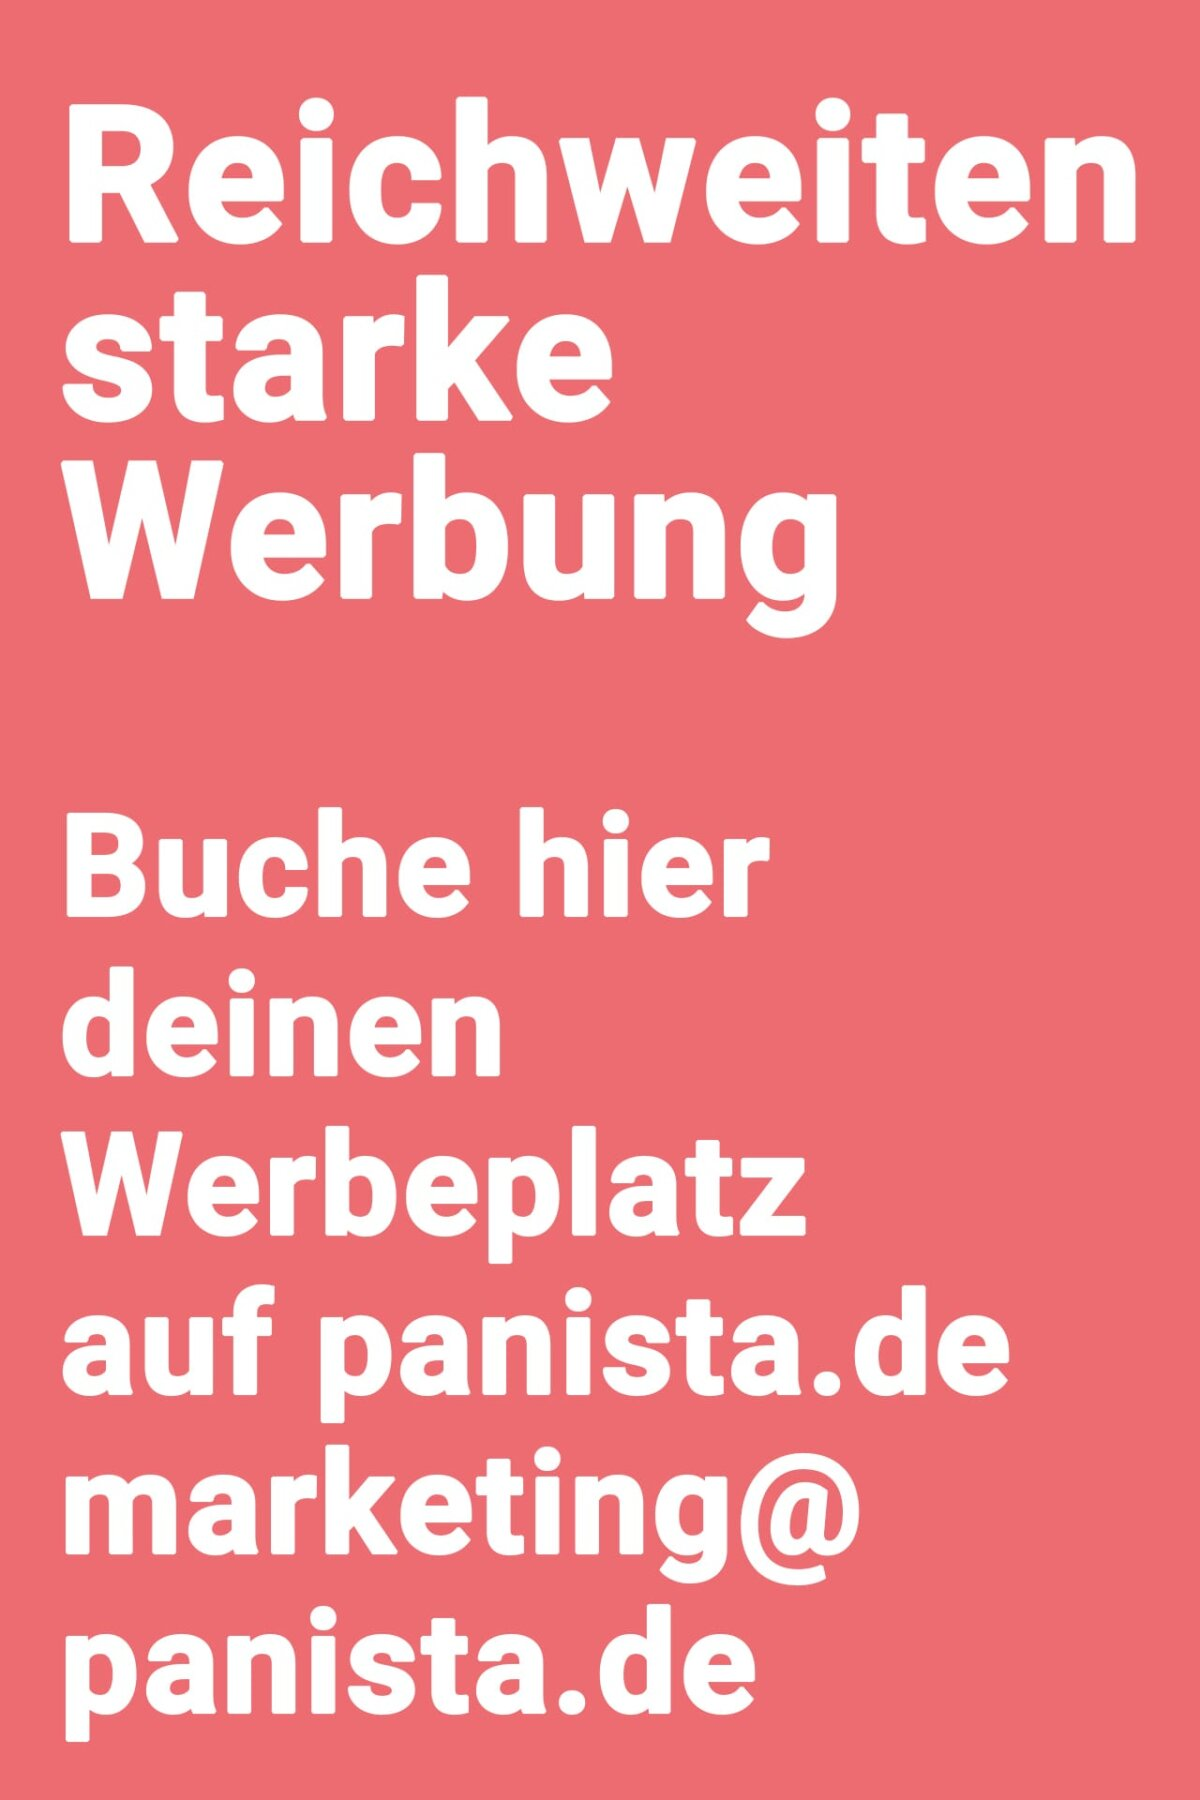 werbung-panista-de